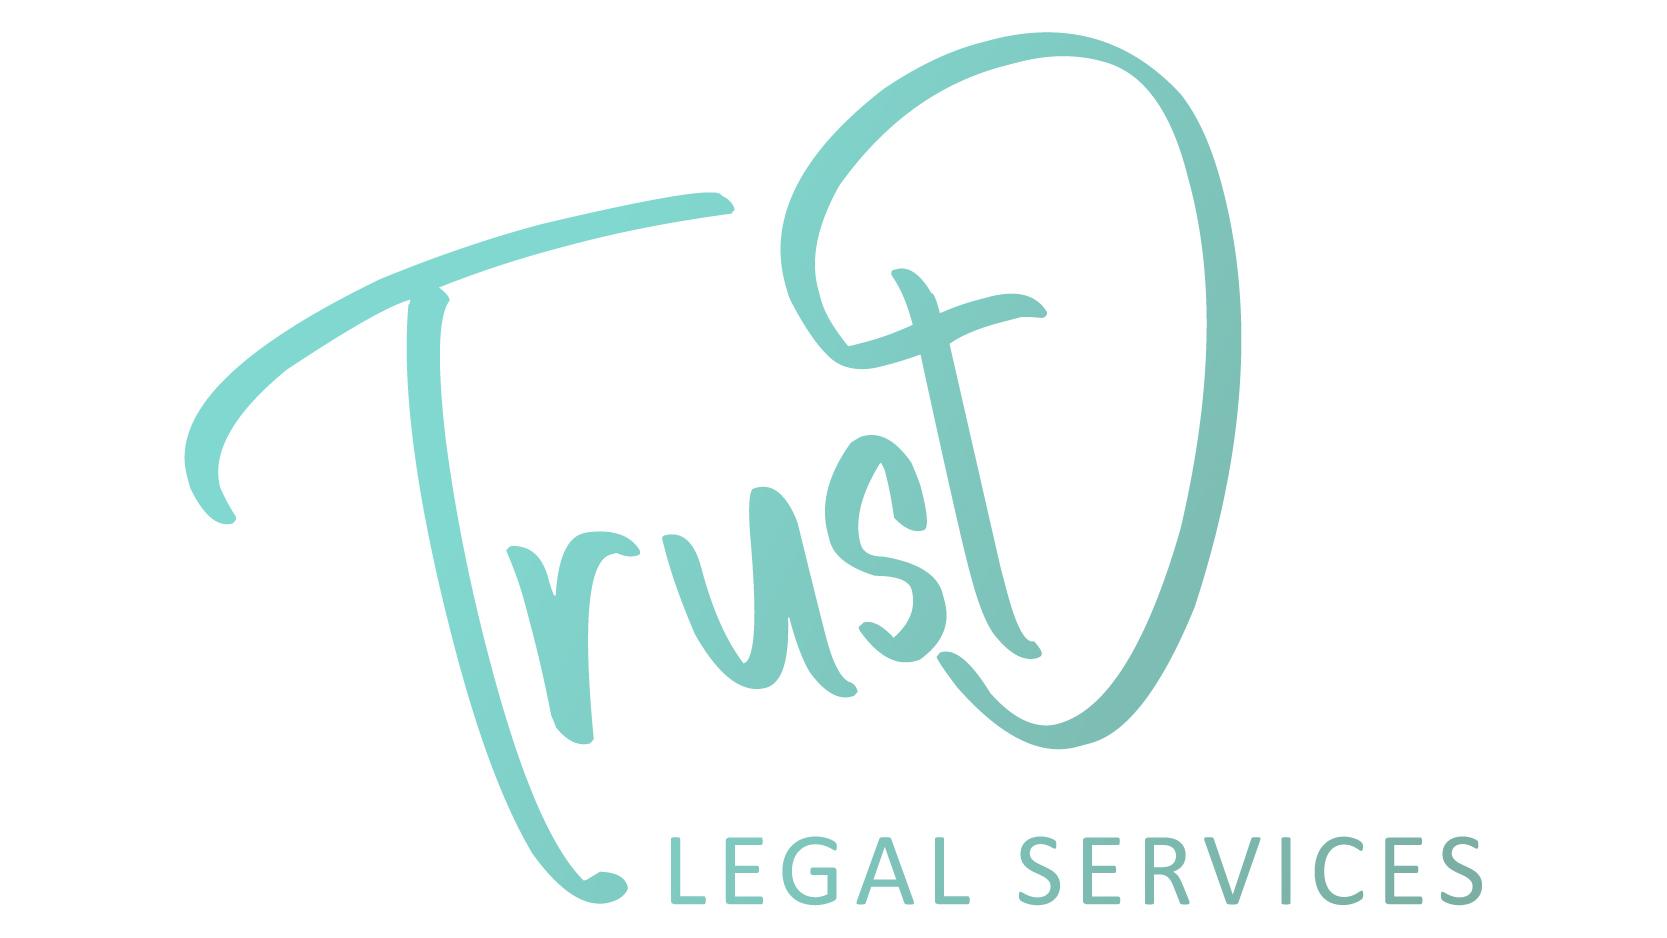 Read Trustd Legal Services Reviews